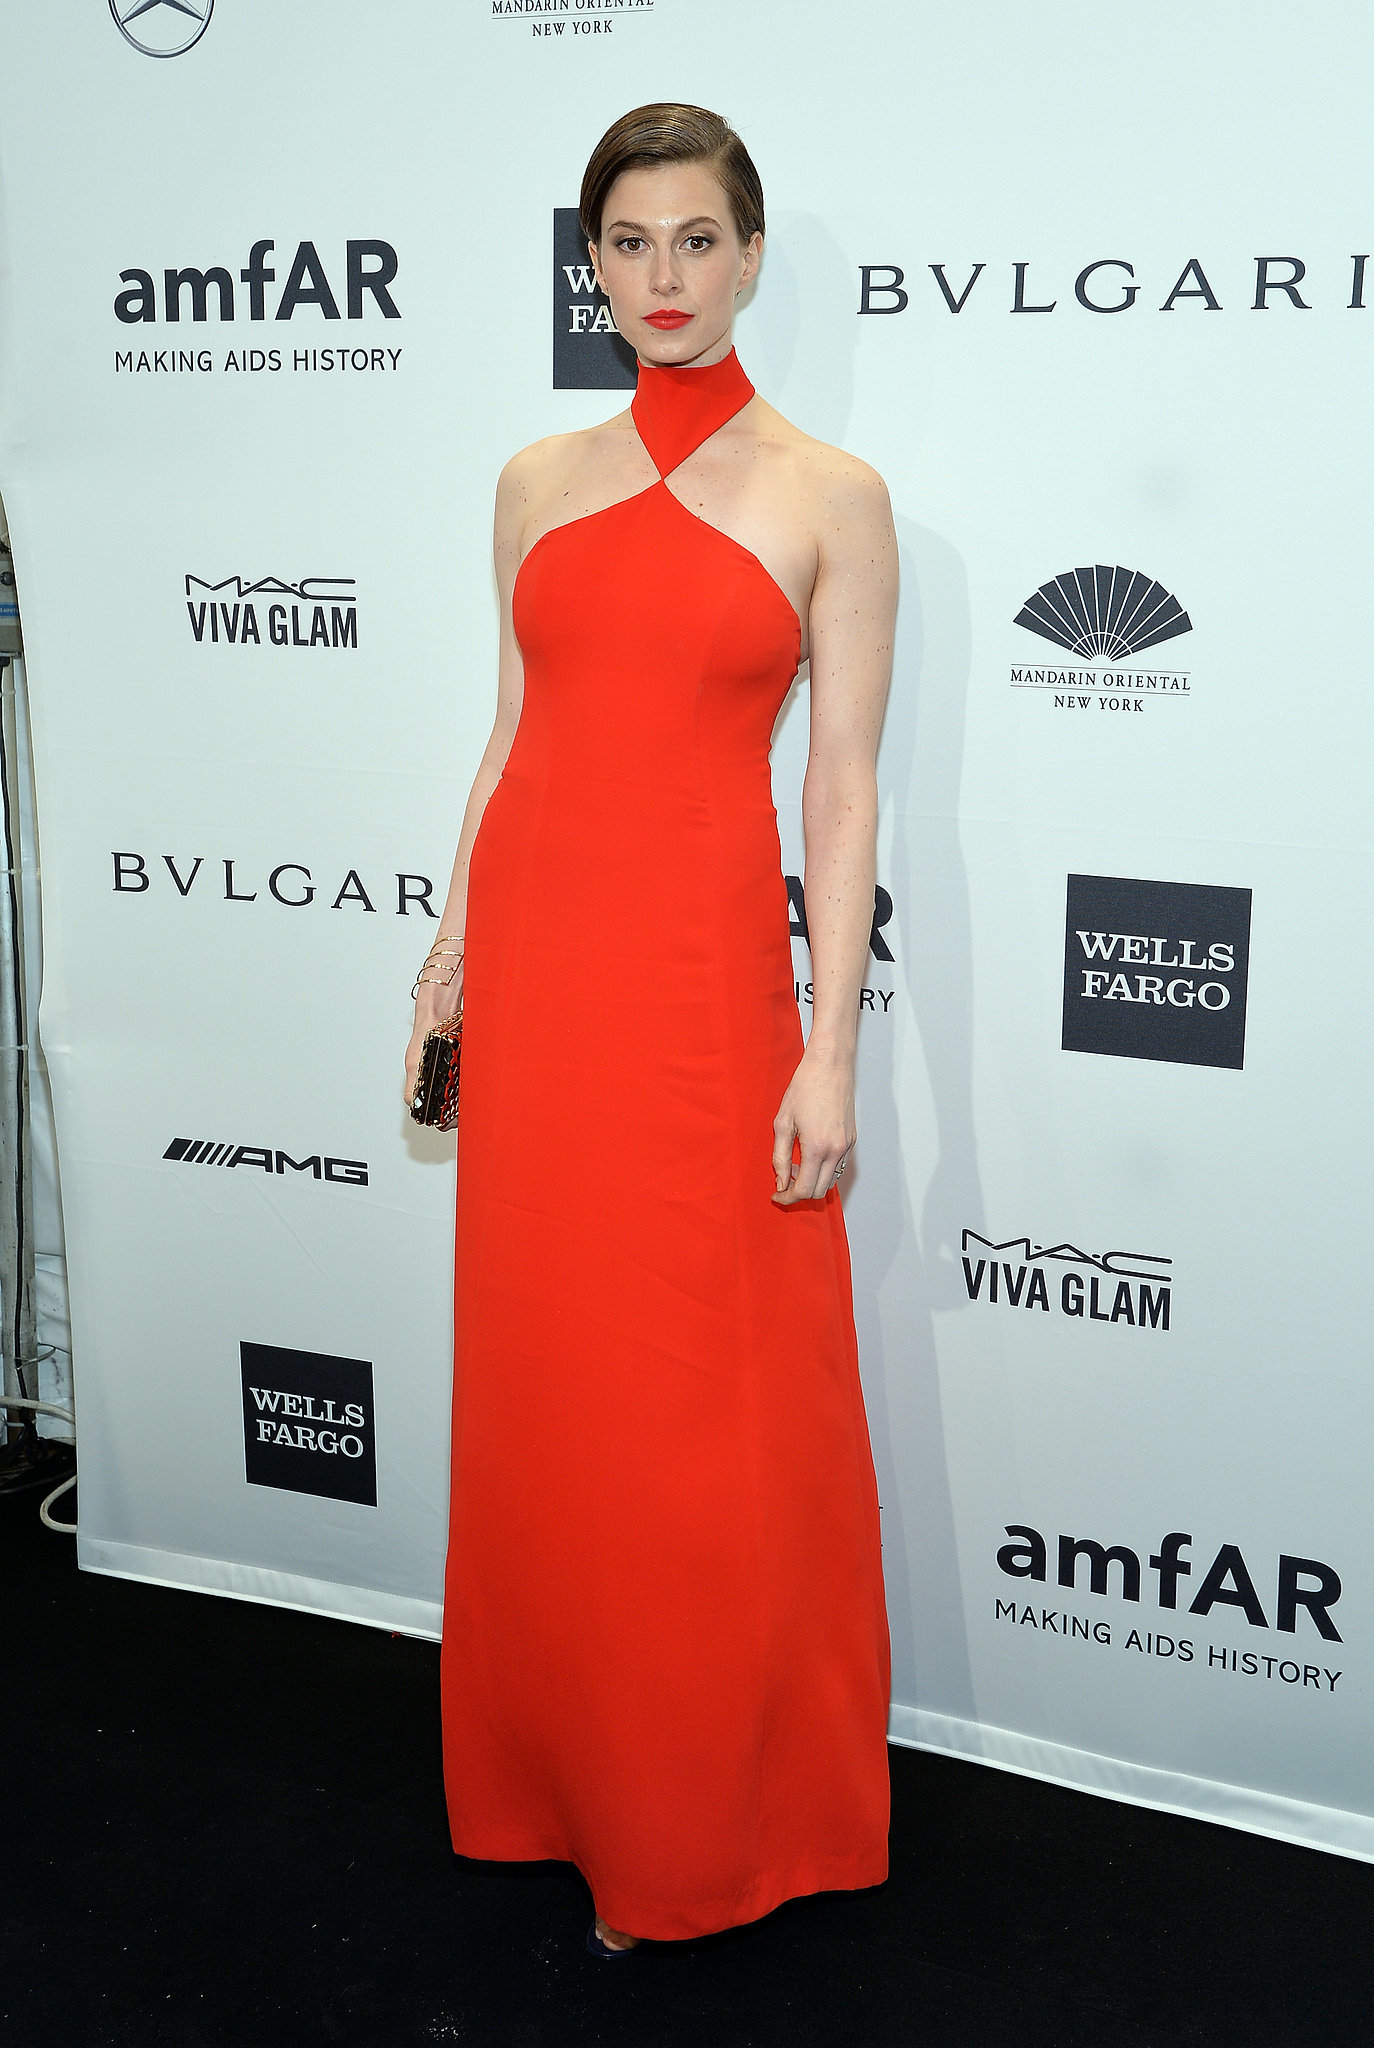 Elettra Wiedemann, wearing Ana Khouri, at amfAR's New York Gala.